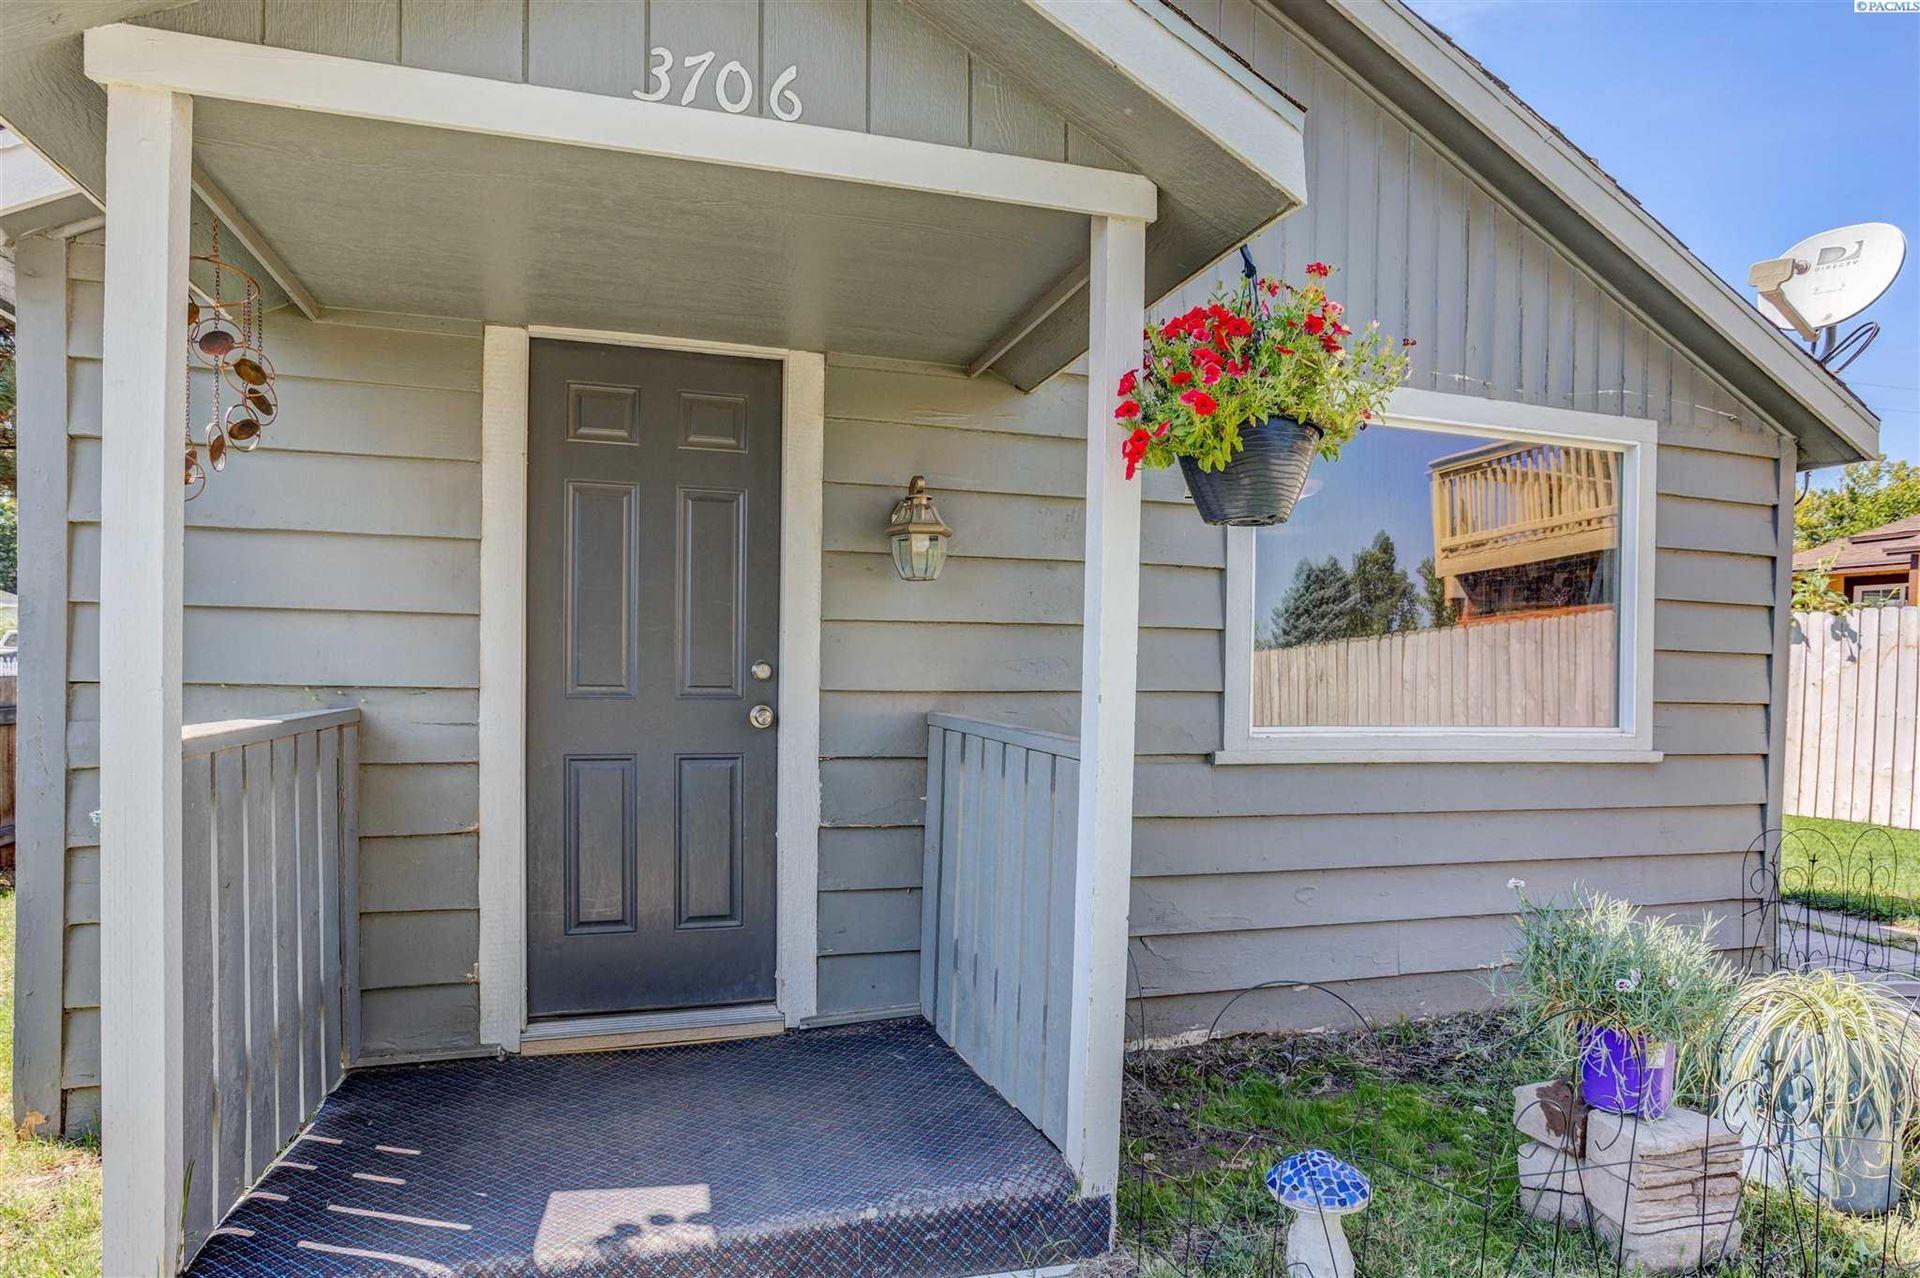 Photo of 3706 Grant Loop, West Richland, WA 99353 (MLS # 255775)